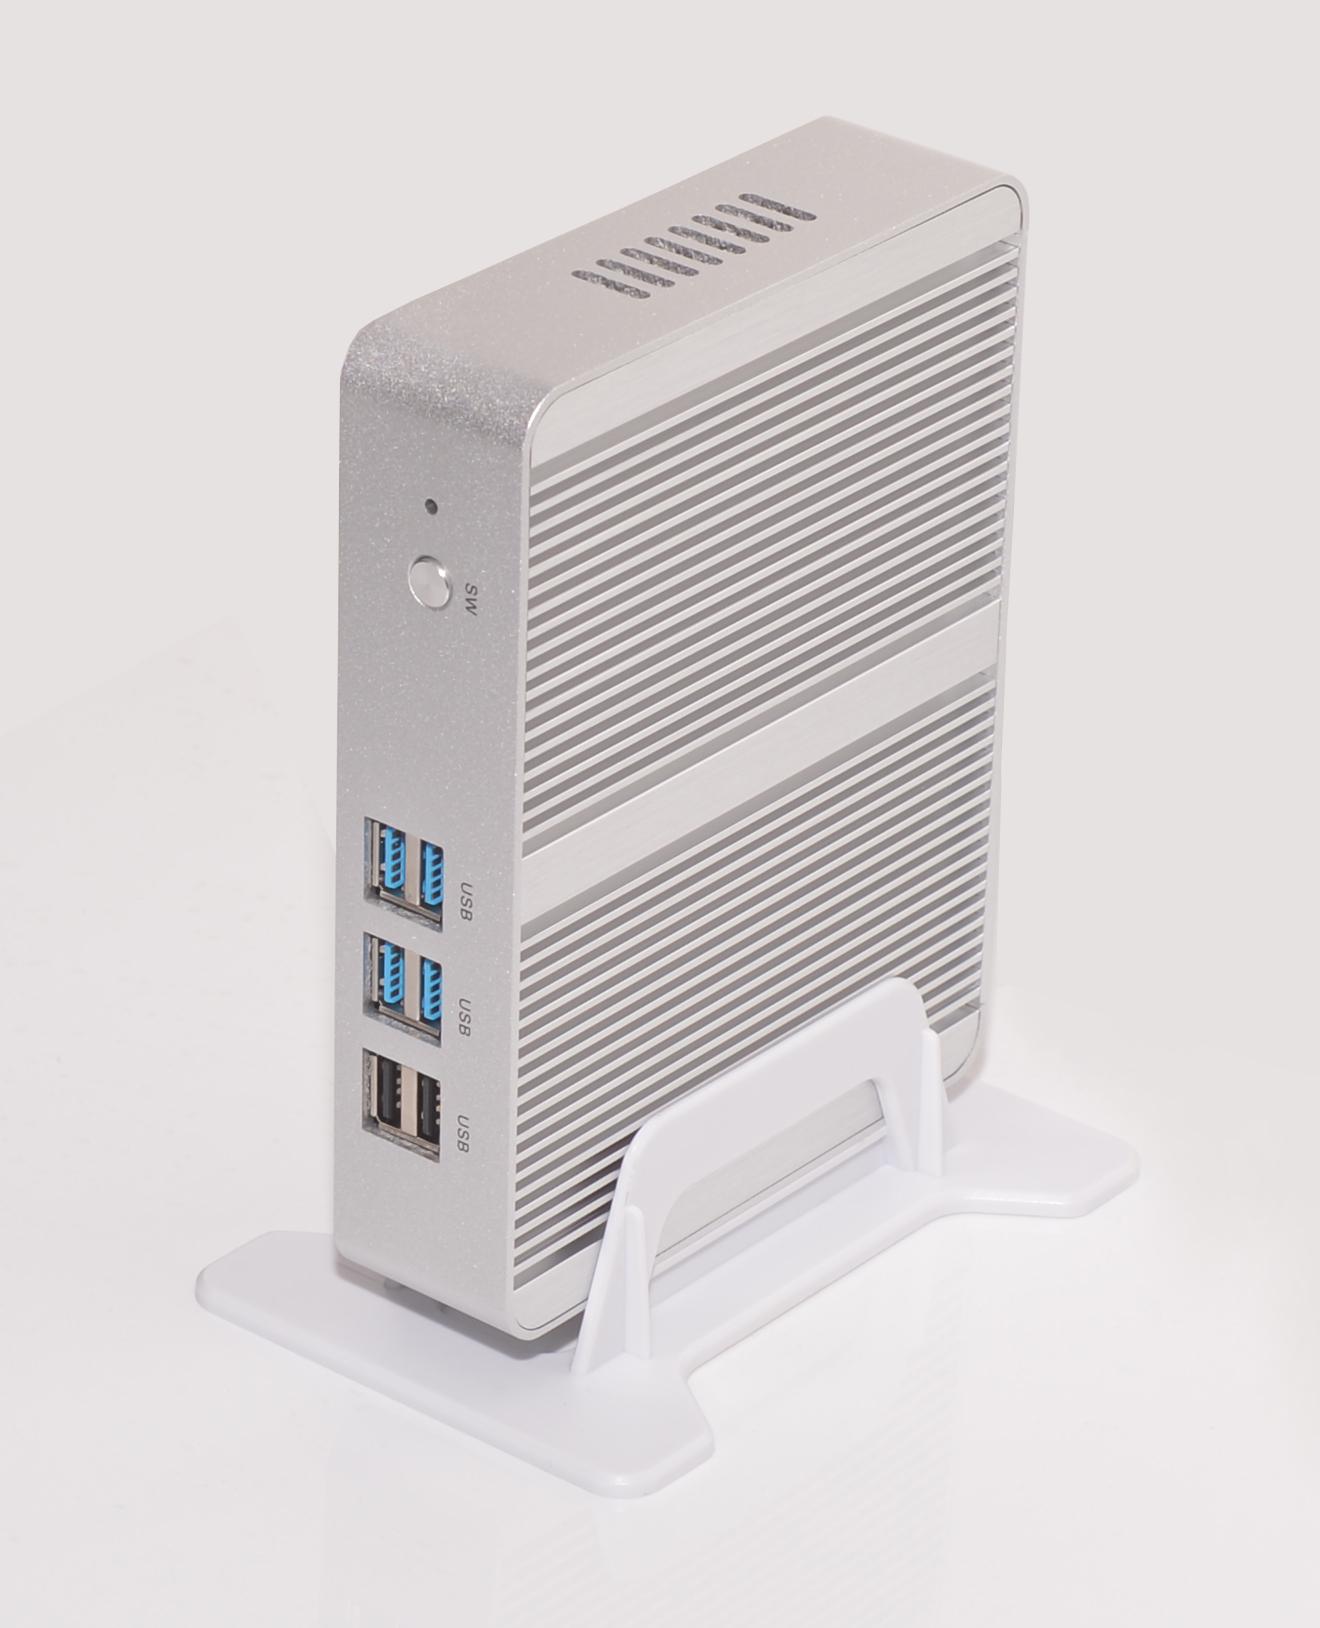 Namek Mini PC N3150 With Stand